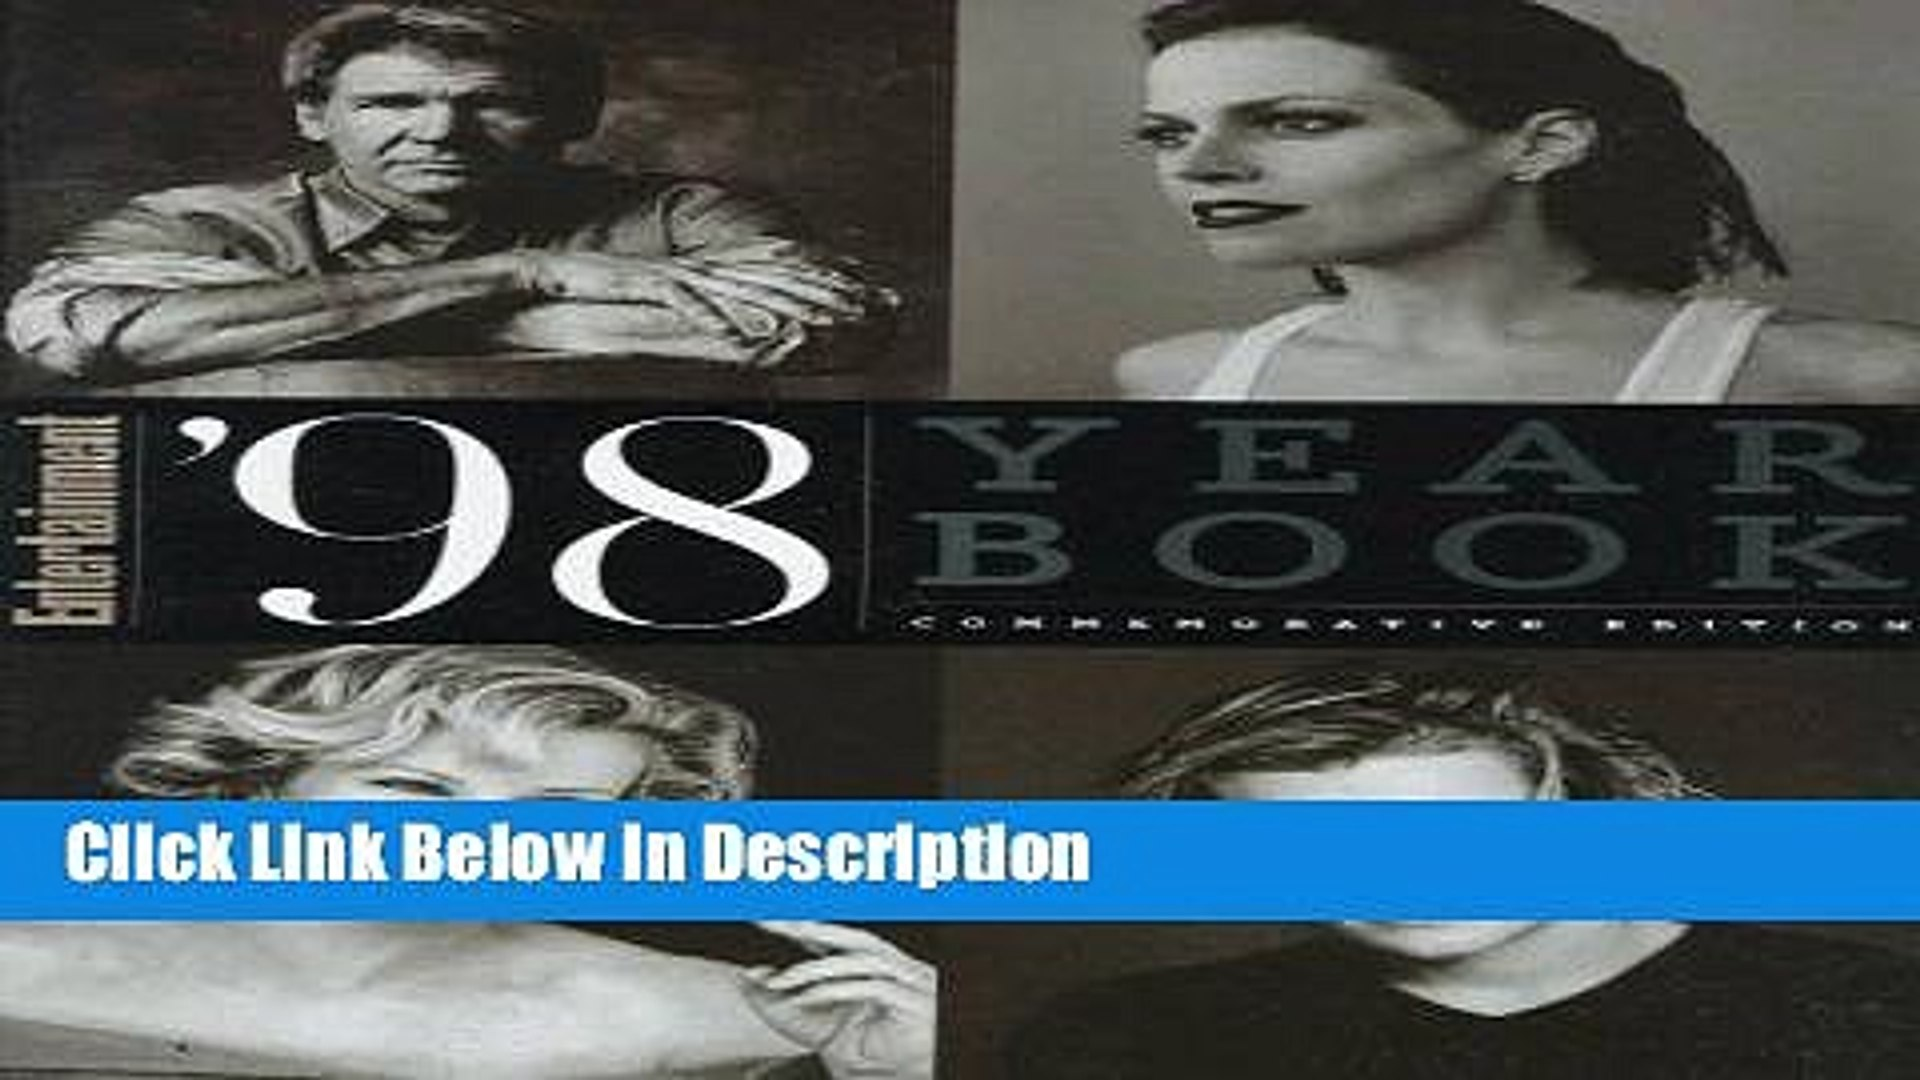 PDF Entertainment Weekly 1998 Yearbook (Entertainment Weekly Yearbook) Epub Online free